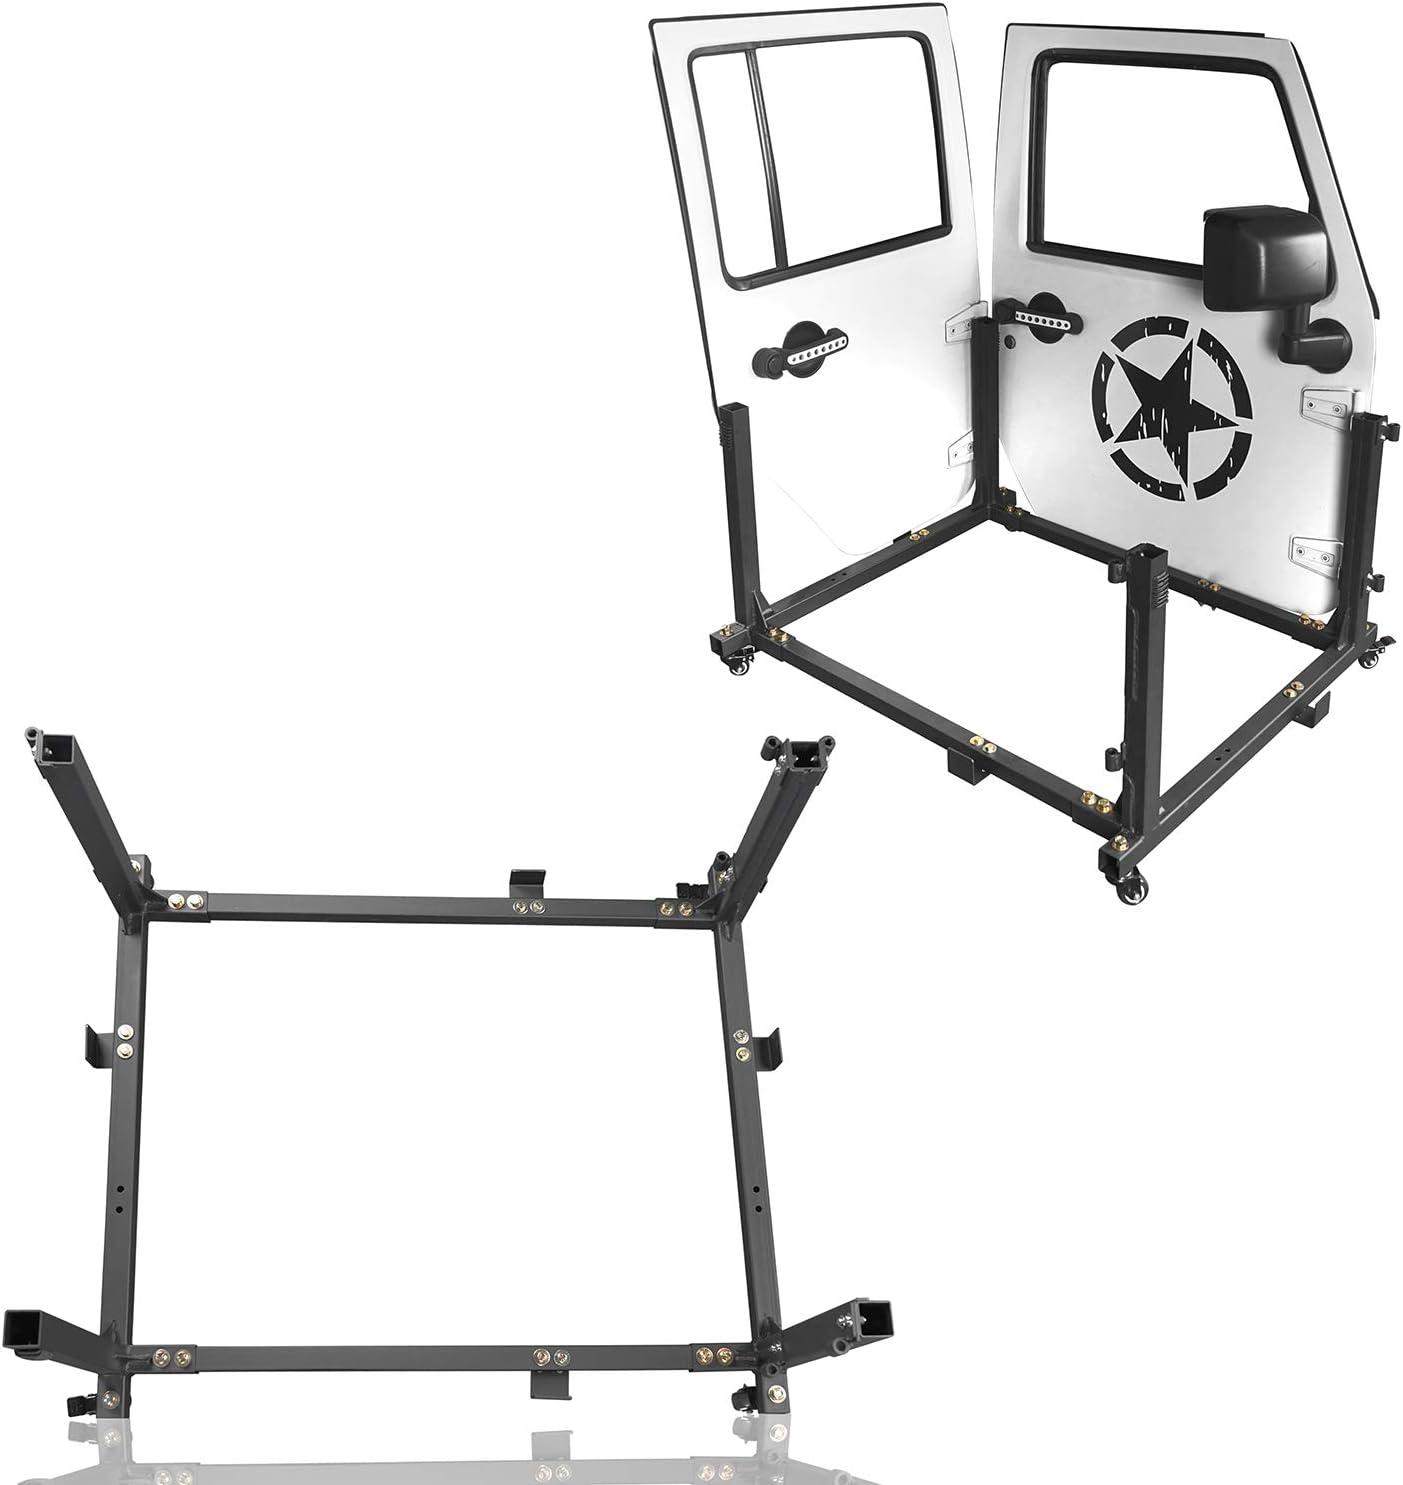 u-Box 5%OFF for Jeep Wrangler Door 初回限定 Ho Cart Storage Hanger Movable